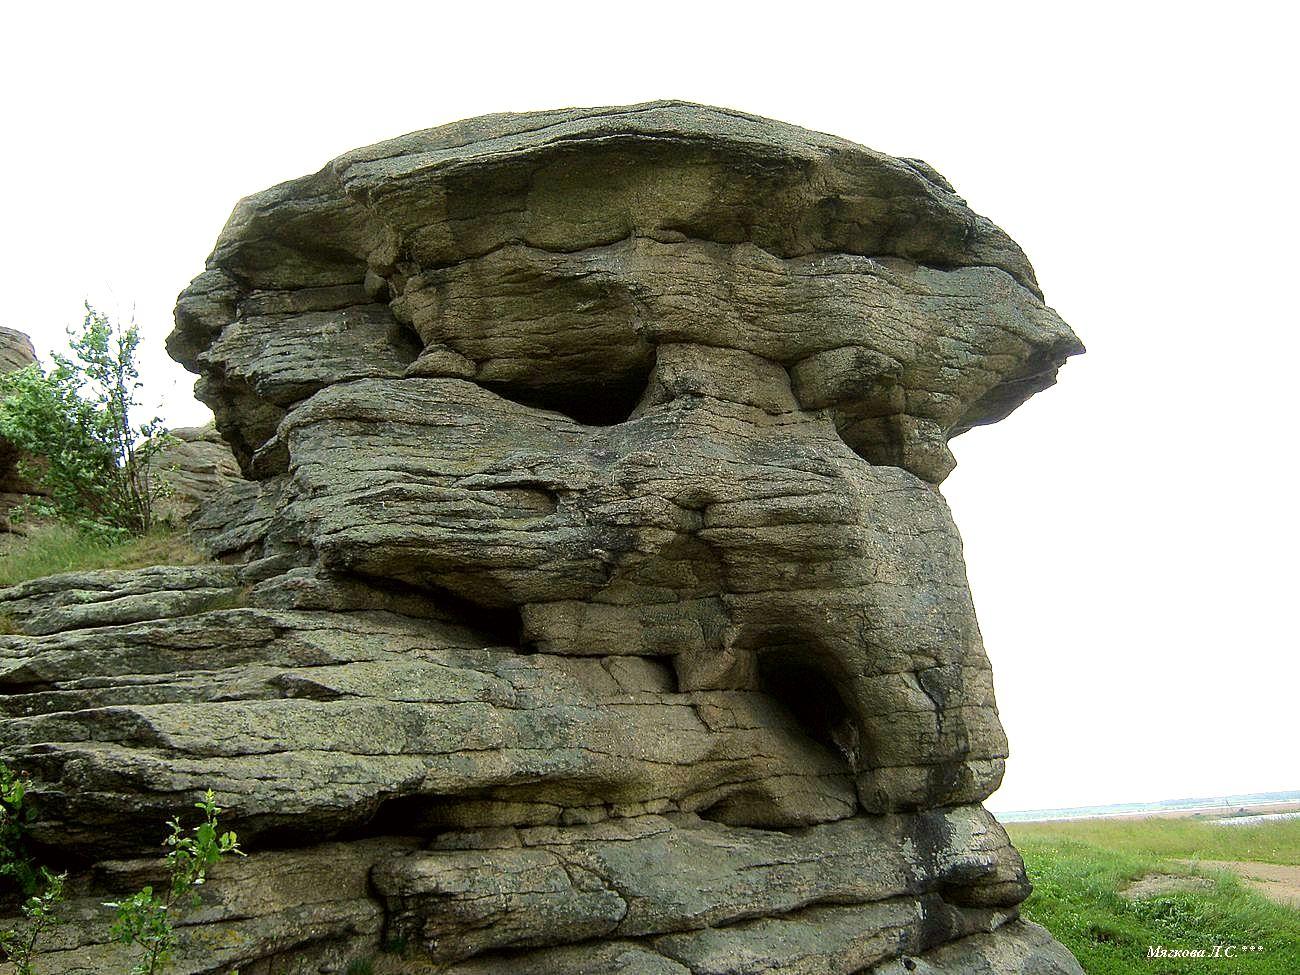 000 камень гриб.jpg